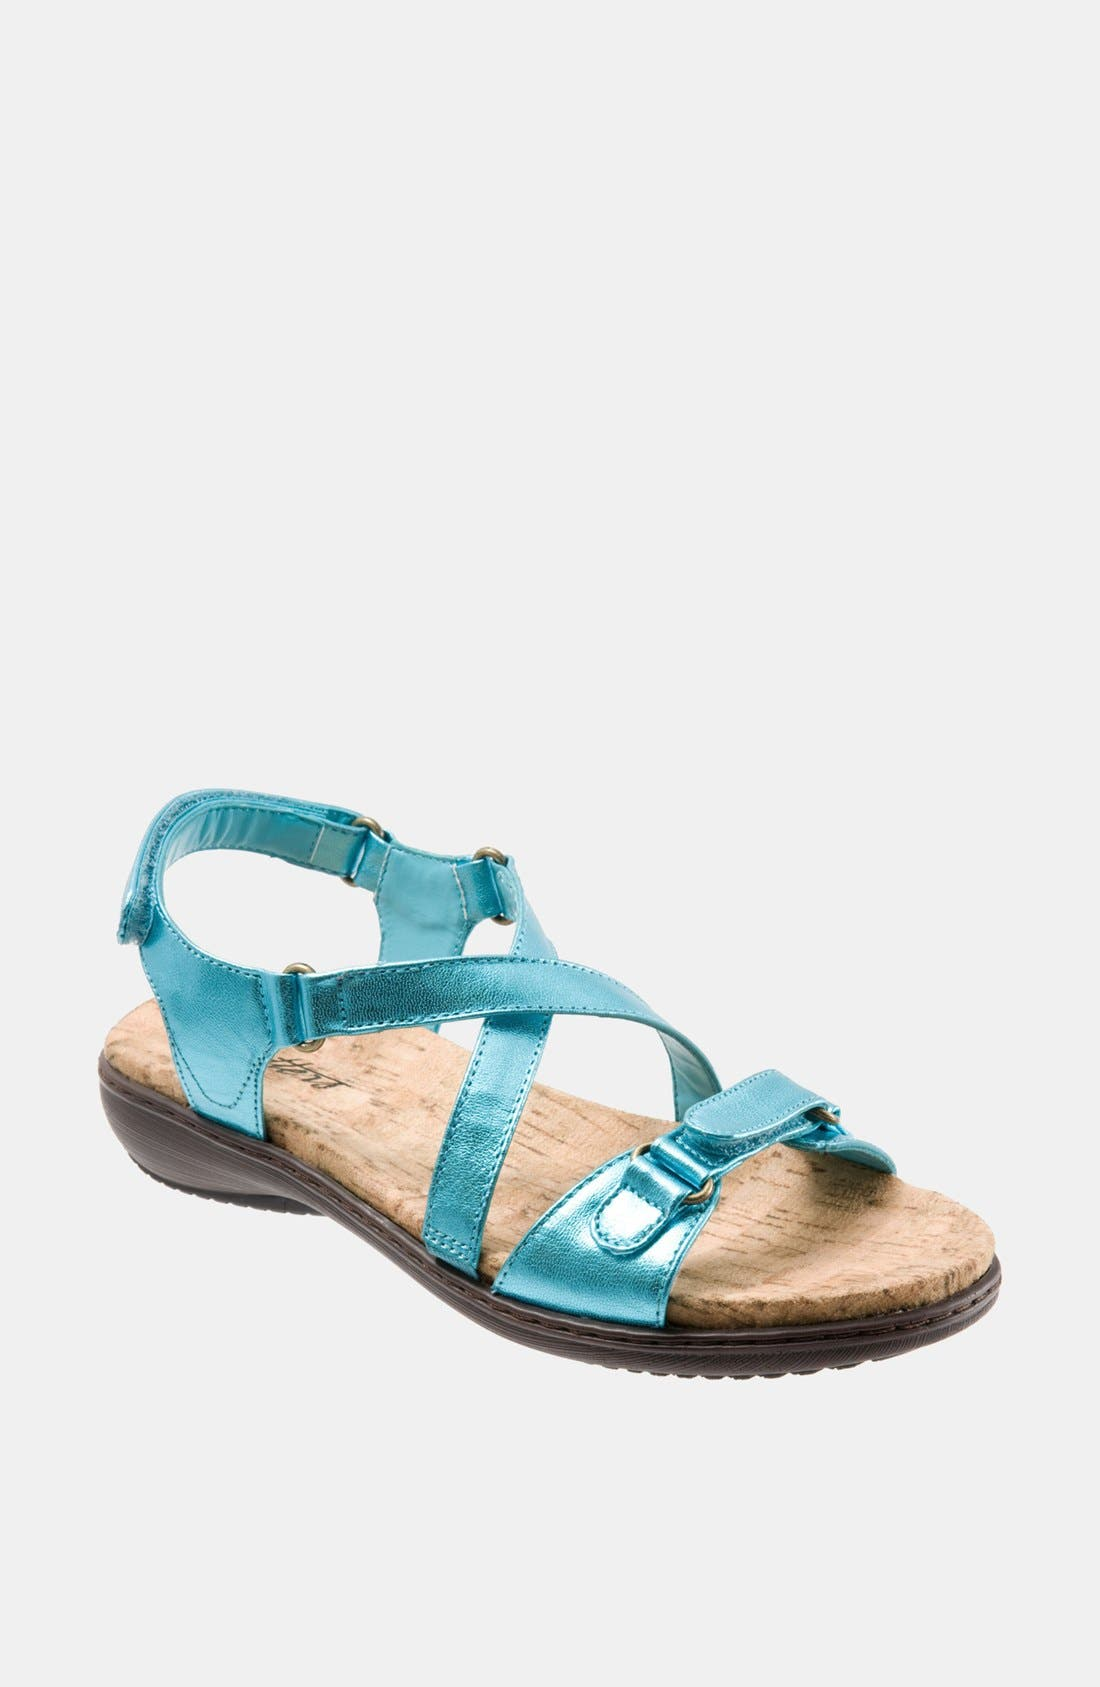 Alternate Image 1 Selected - Trotters 'Kylie' Sandal